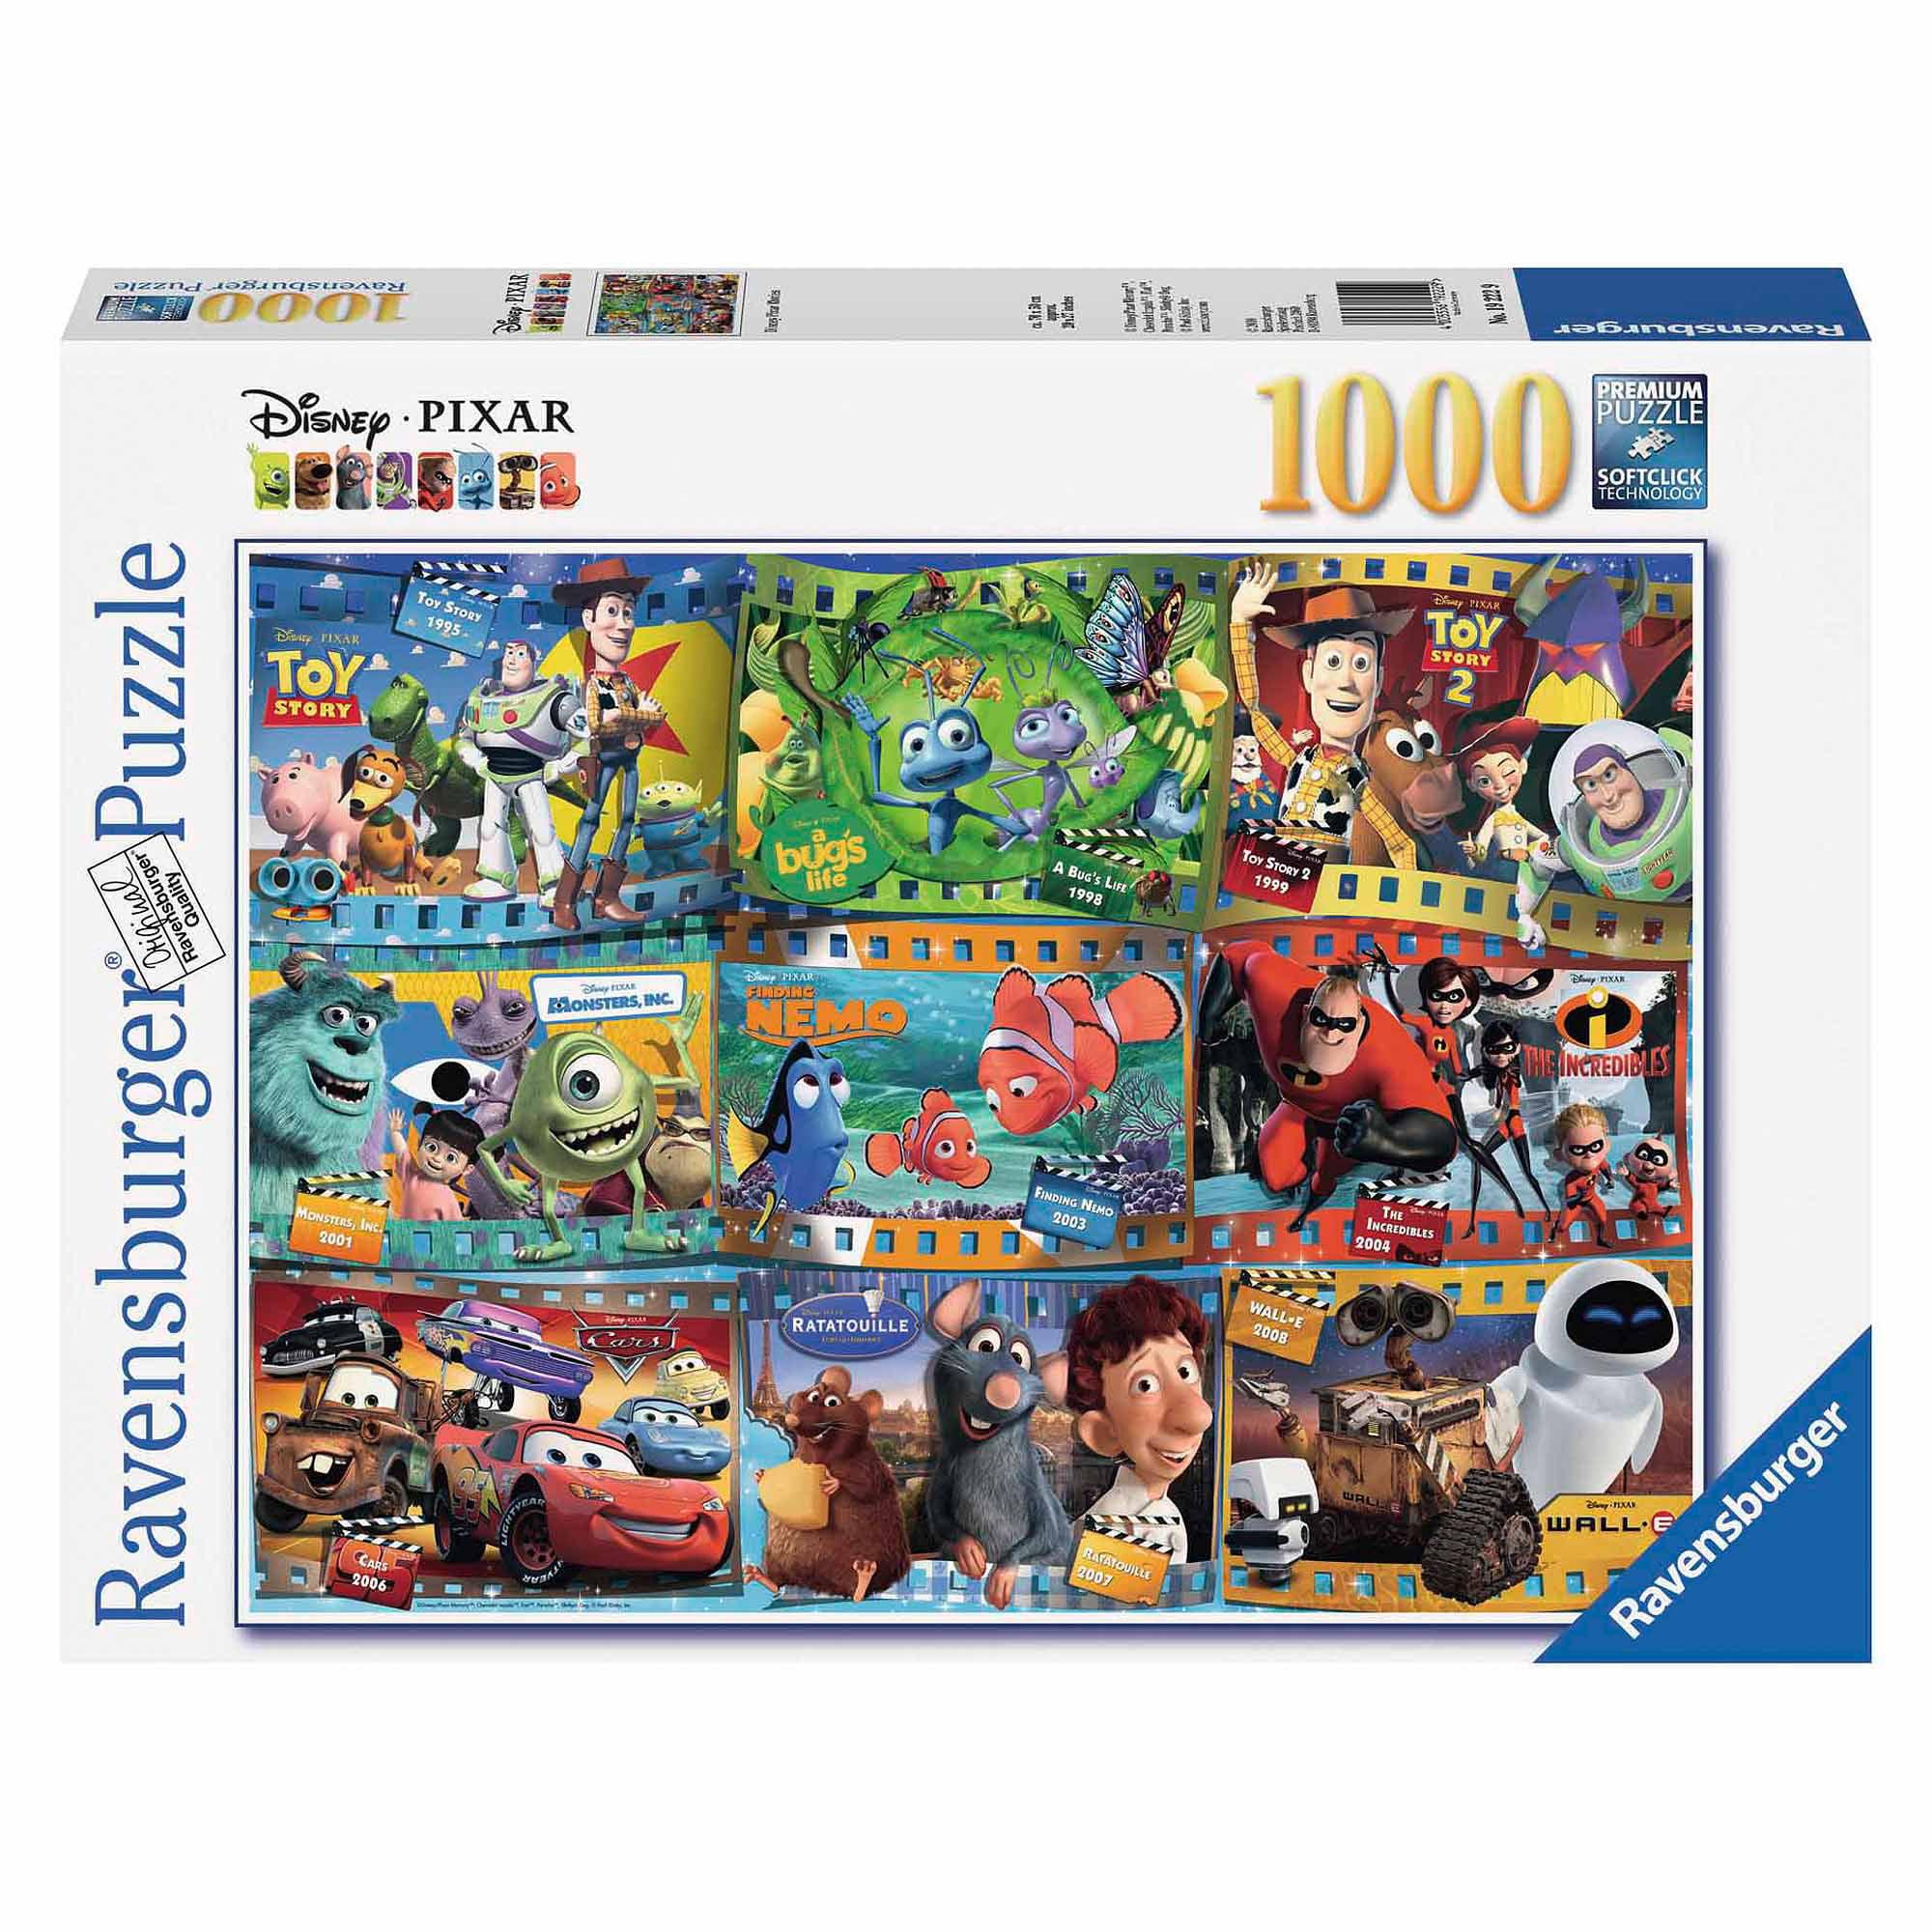 Disney-Pixar Movies Puzzle, 1,000 Pieces